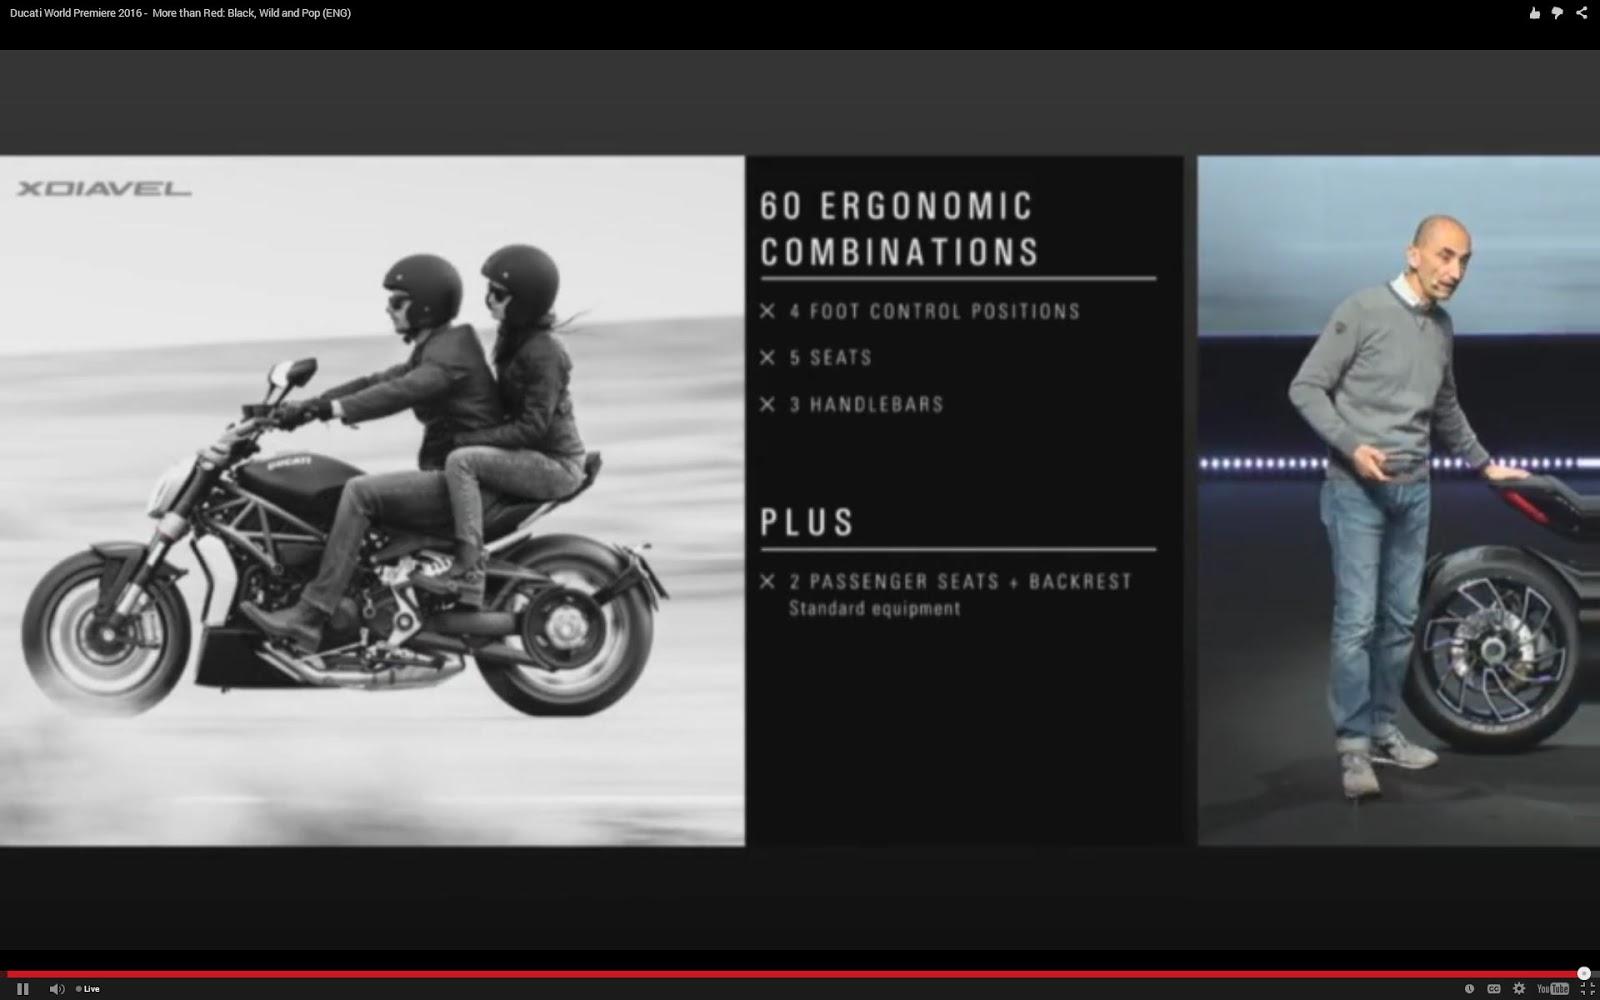 blog of the biker 🏍: xdiavel ducati announcement - new super